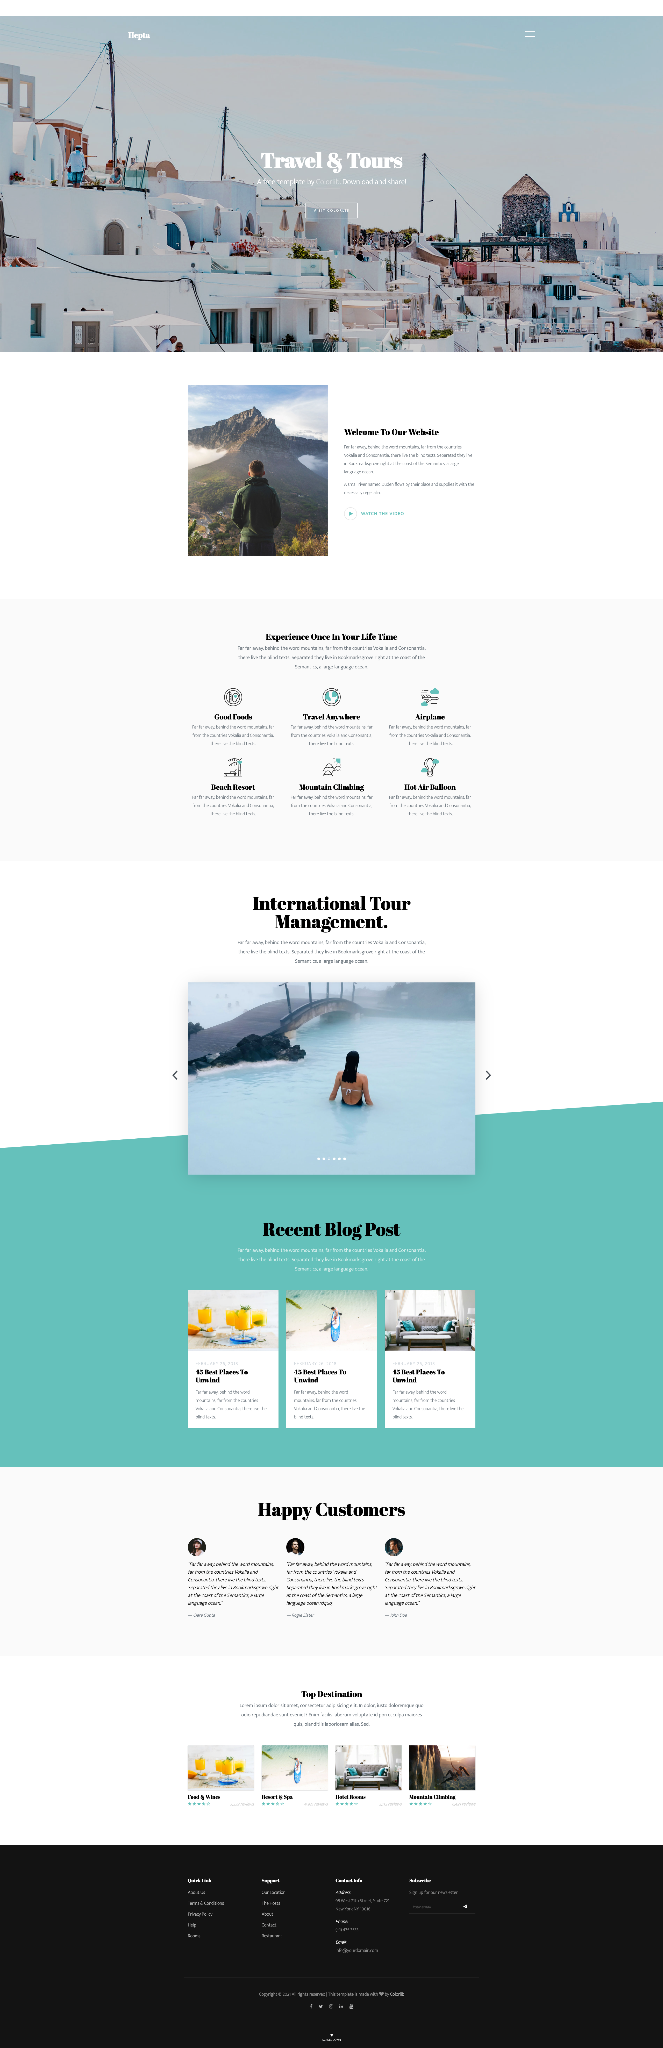 Mẫu website du lịch 3